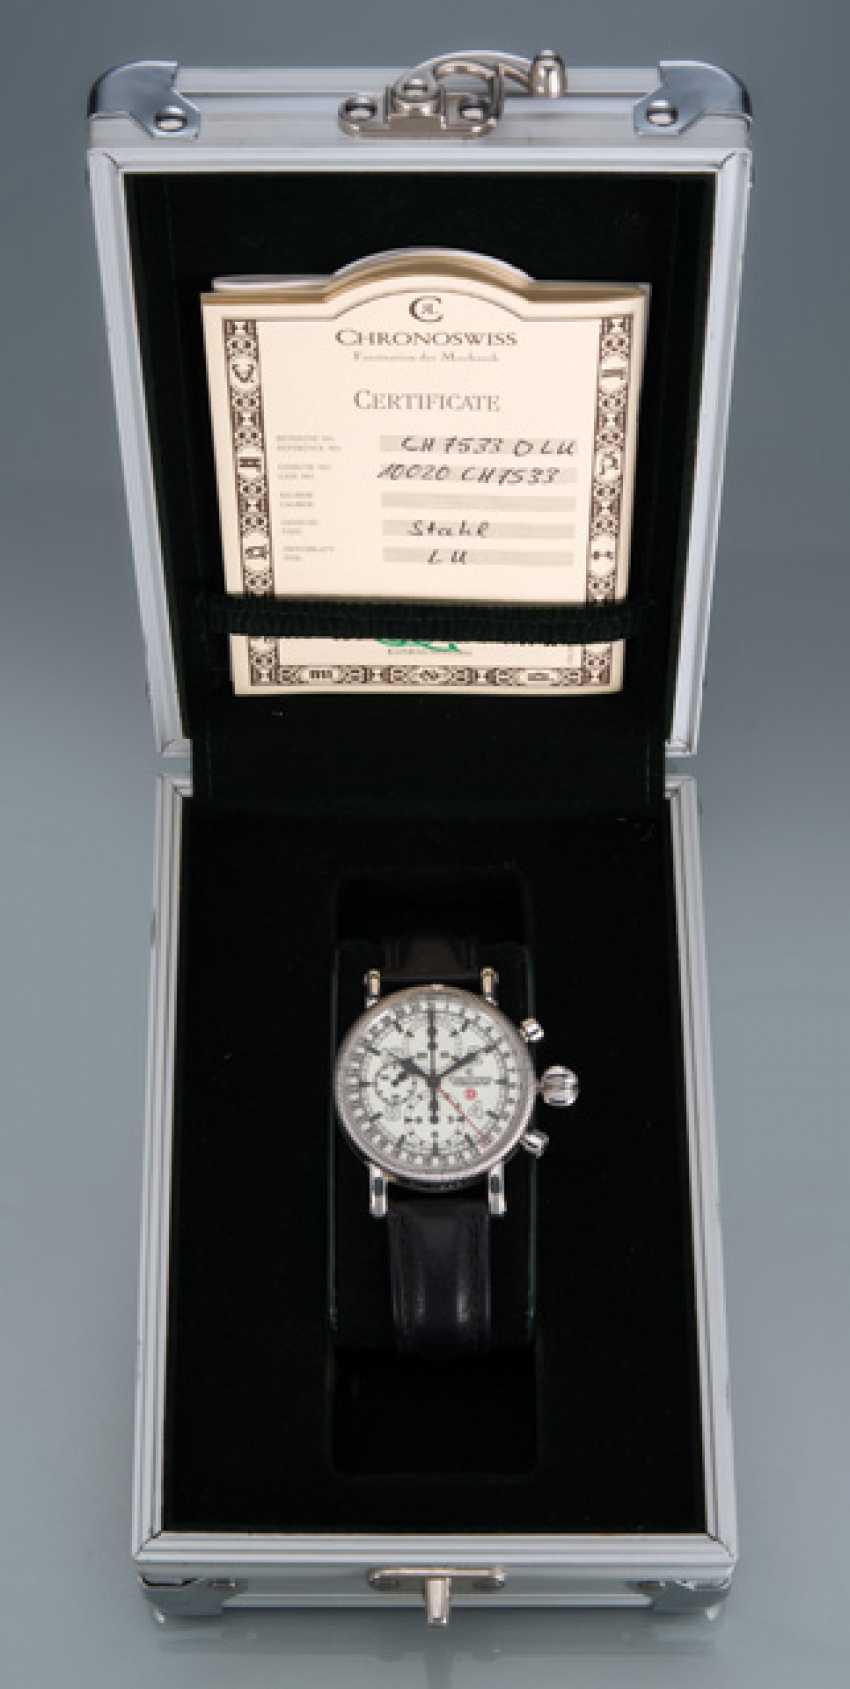 Chronoswiss Timemaster GMT Chronograph, Ref. CH 7533 D LU - photo 2